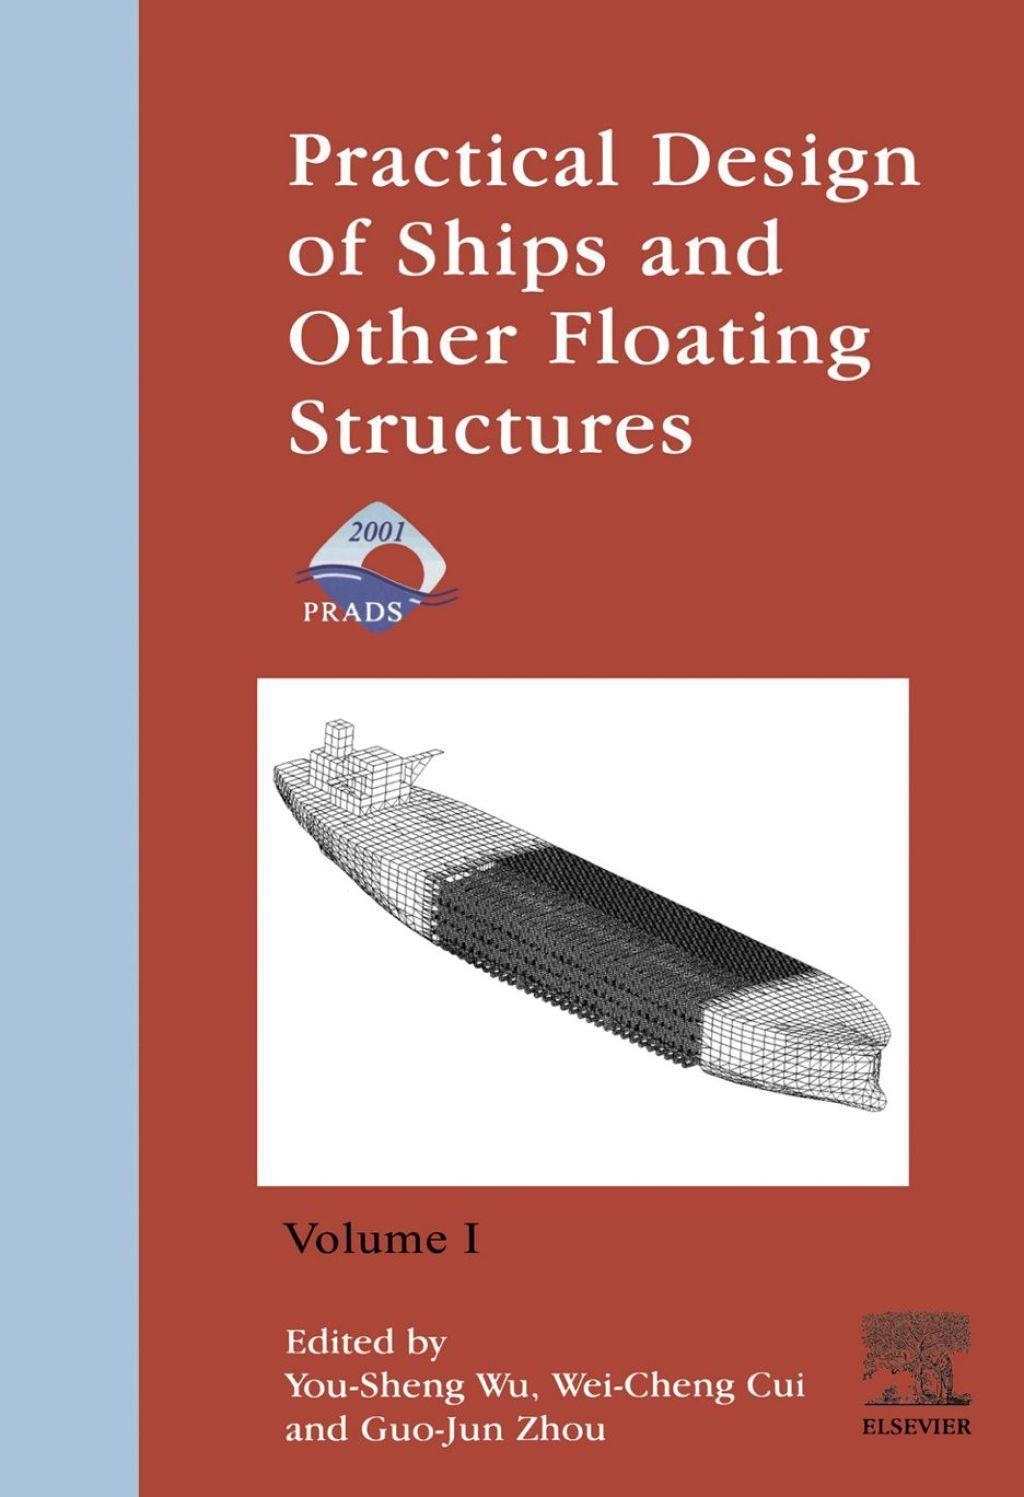 Practical Design Of Ships And Other Floating Structures Eighth International Symposium Prads 2001 2 Volume Set Ebook Floating Design Practice